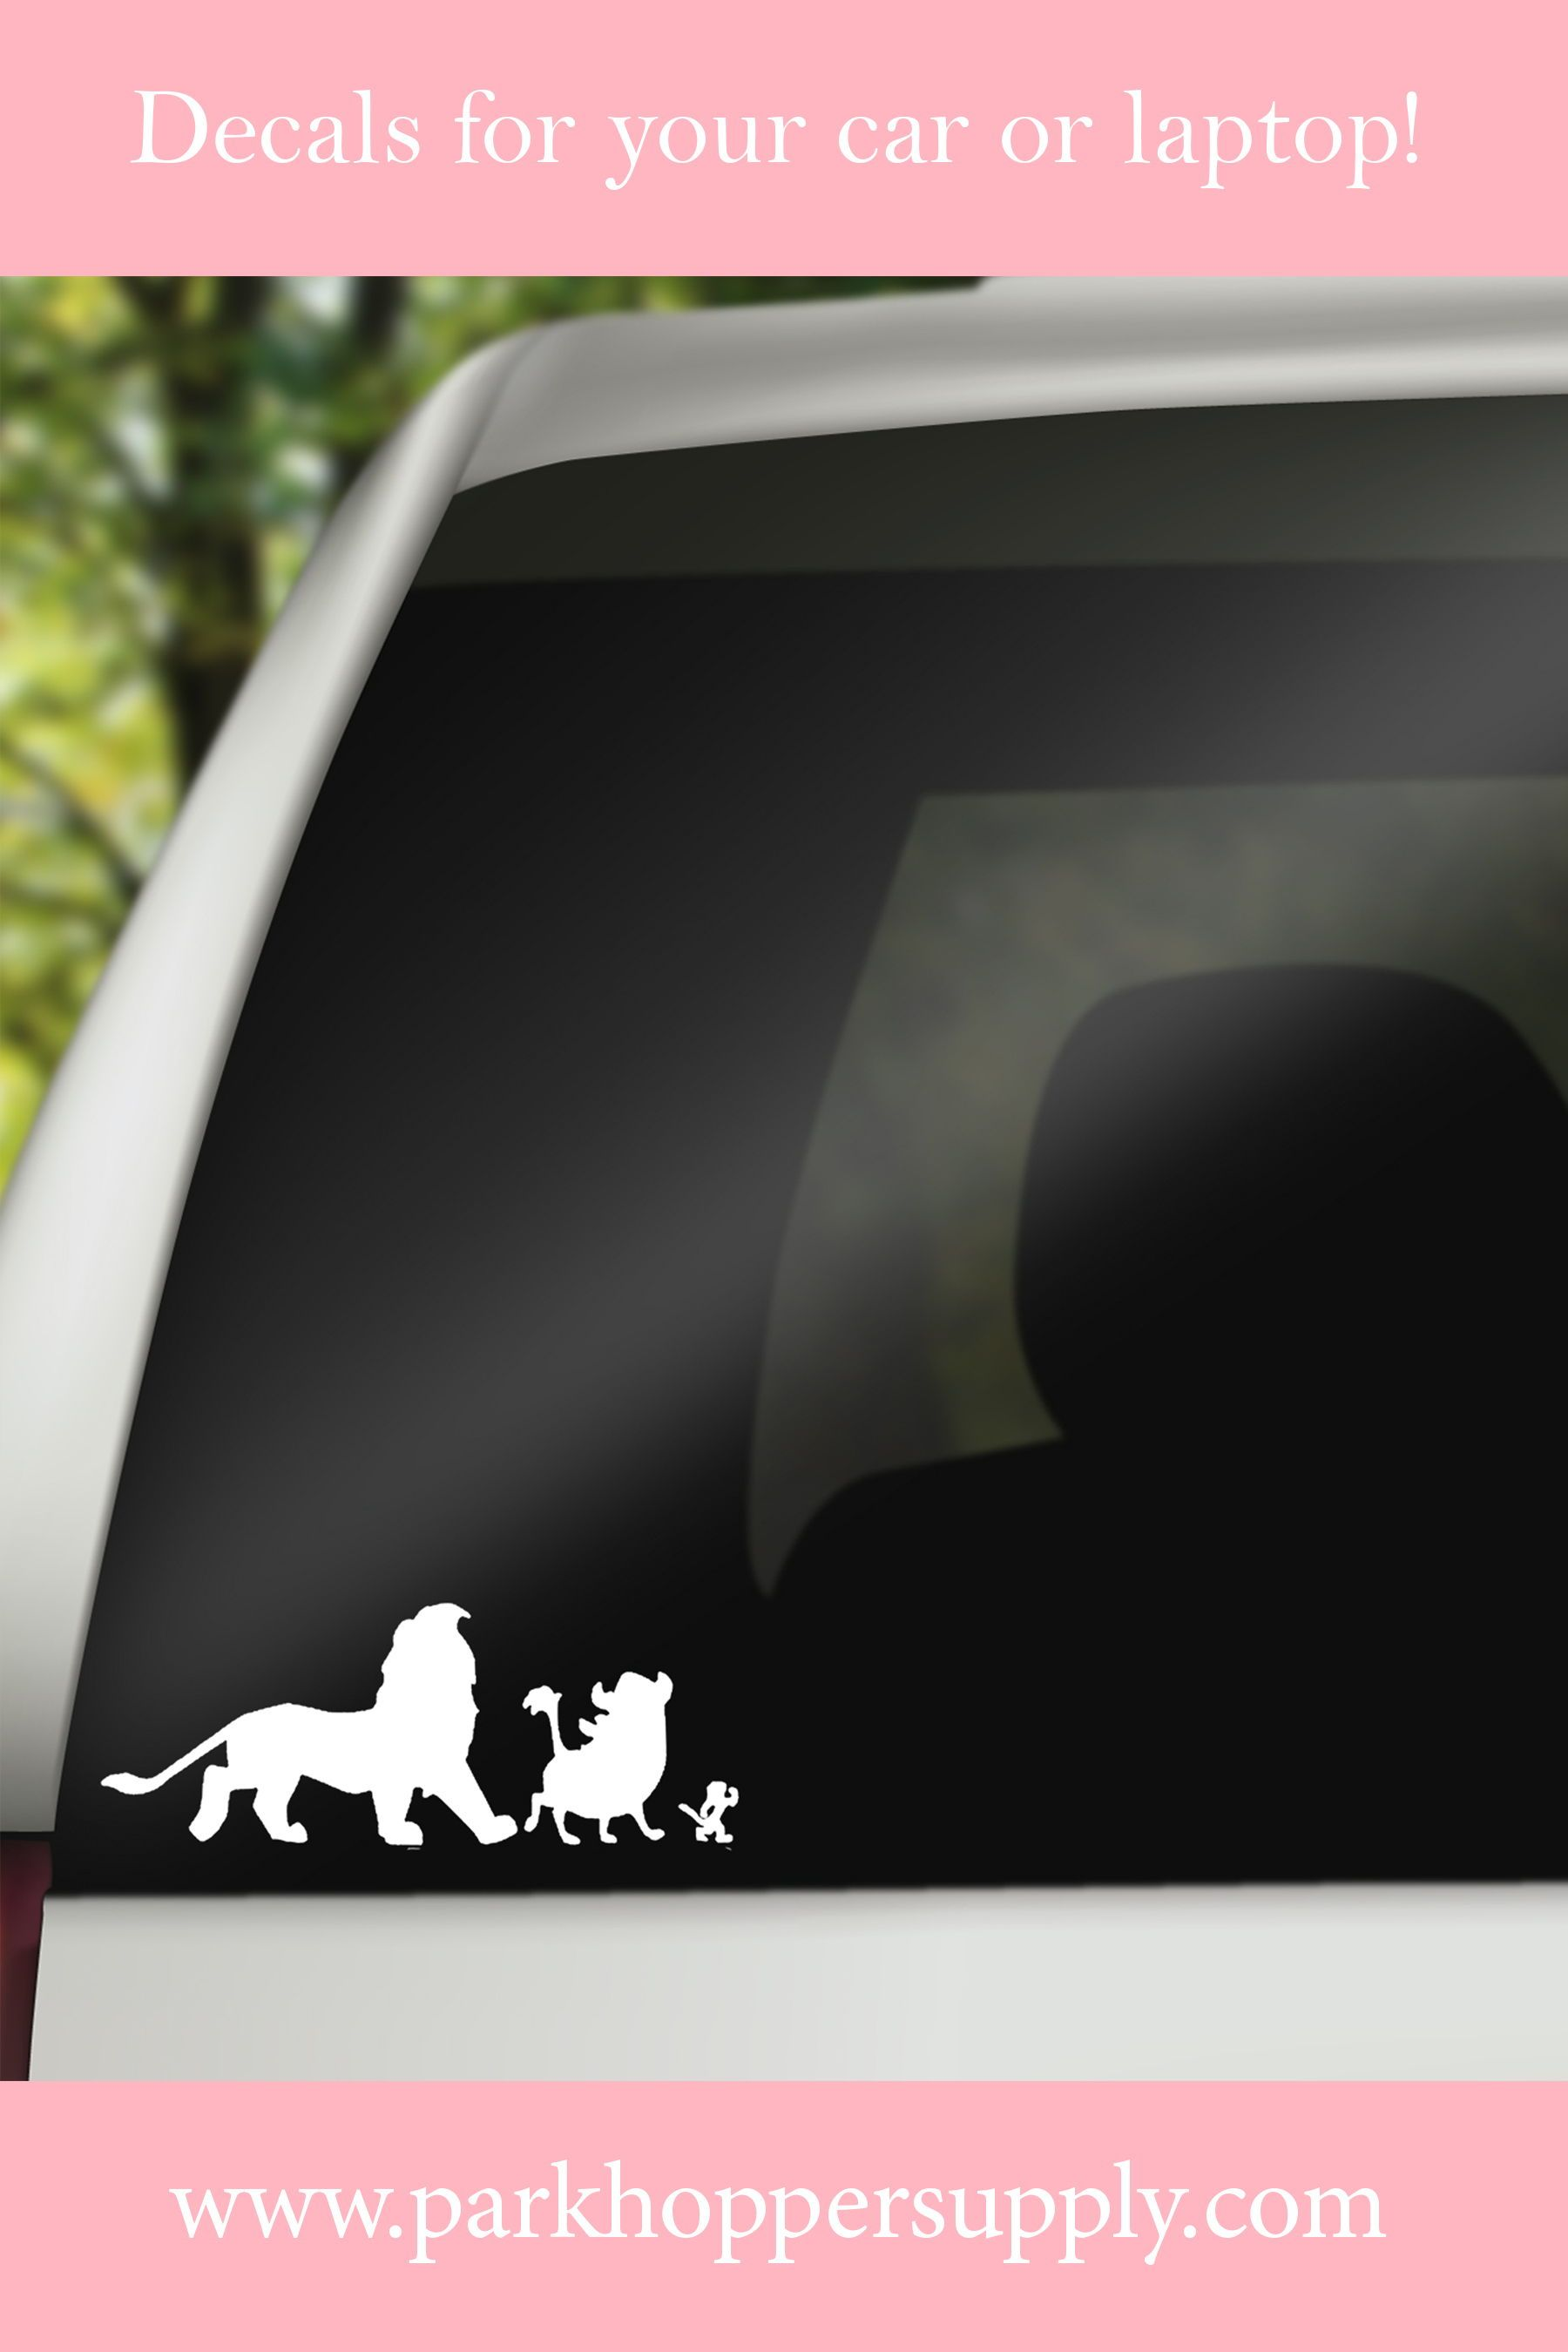 Lion King Car Decal Decals Park Designs Car Decals [ 2700 x 1800 Pixel ]